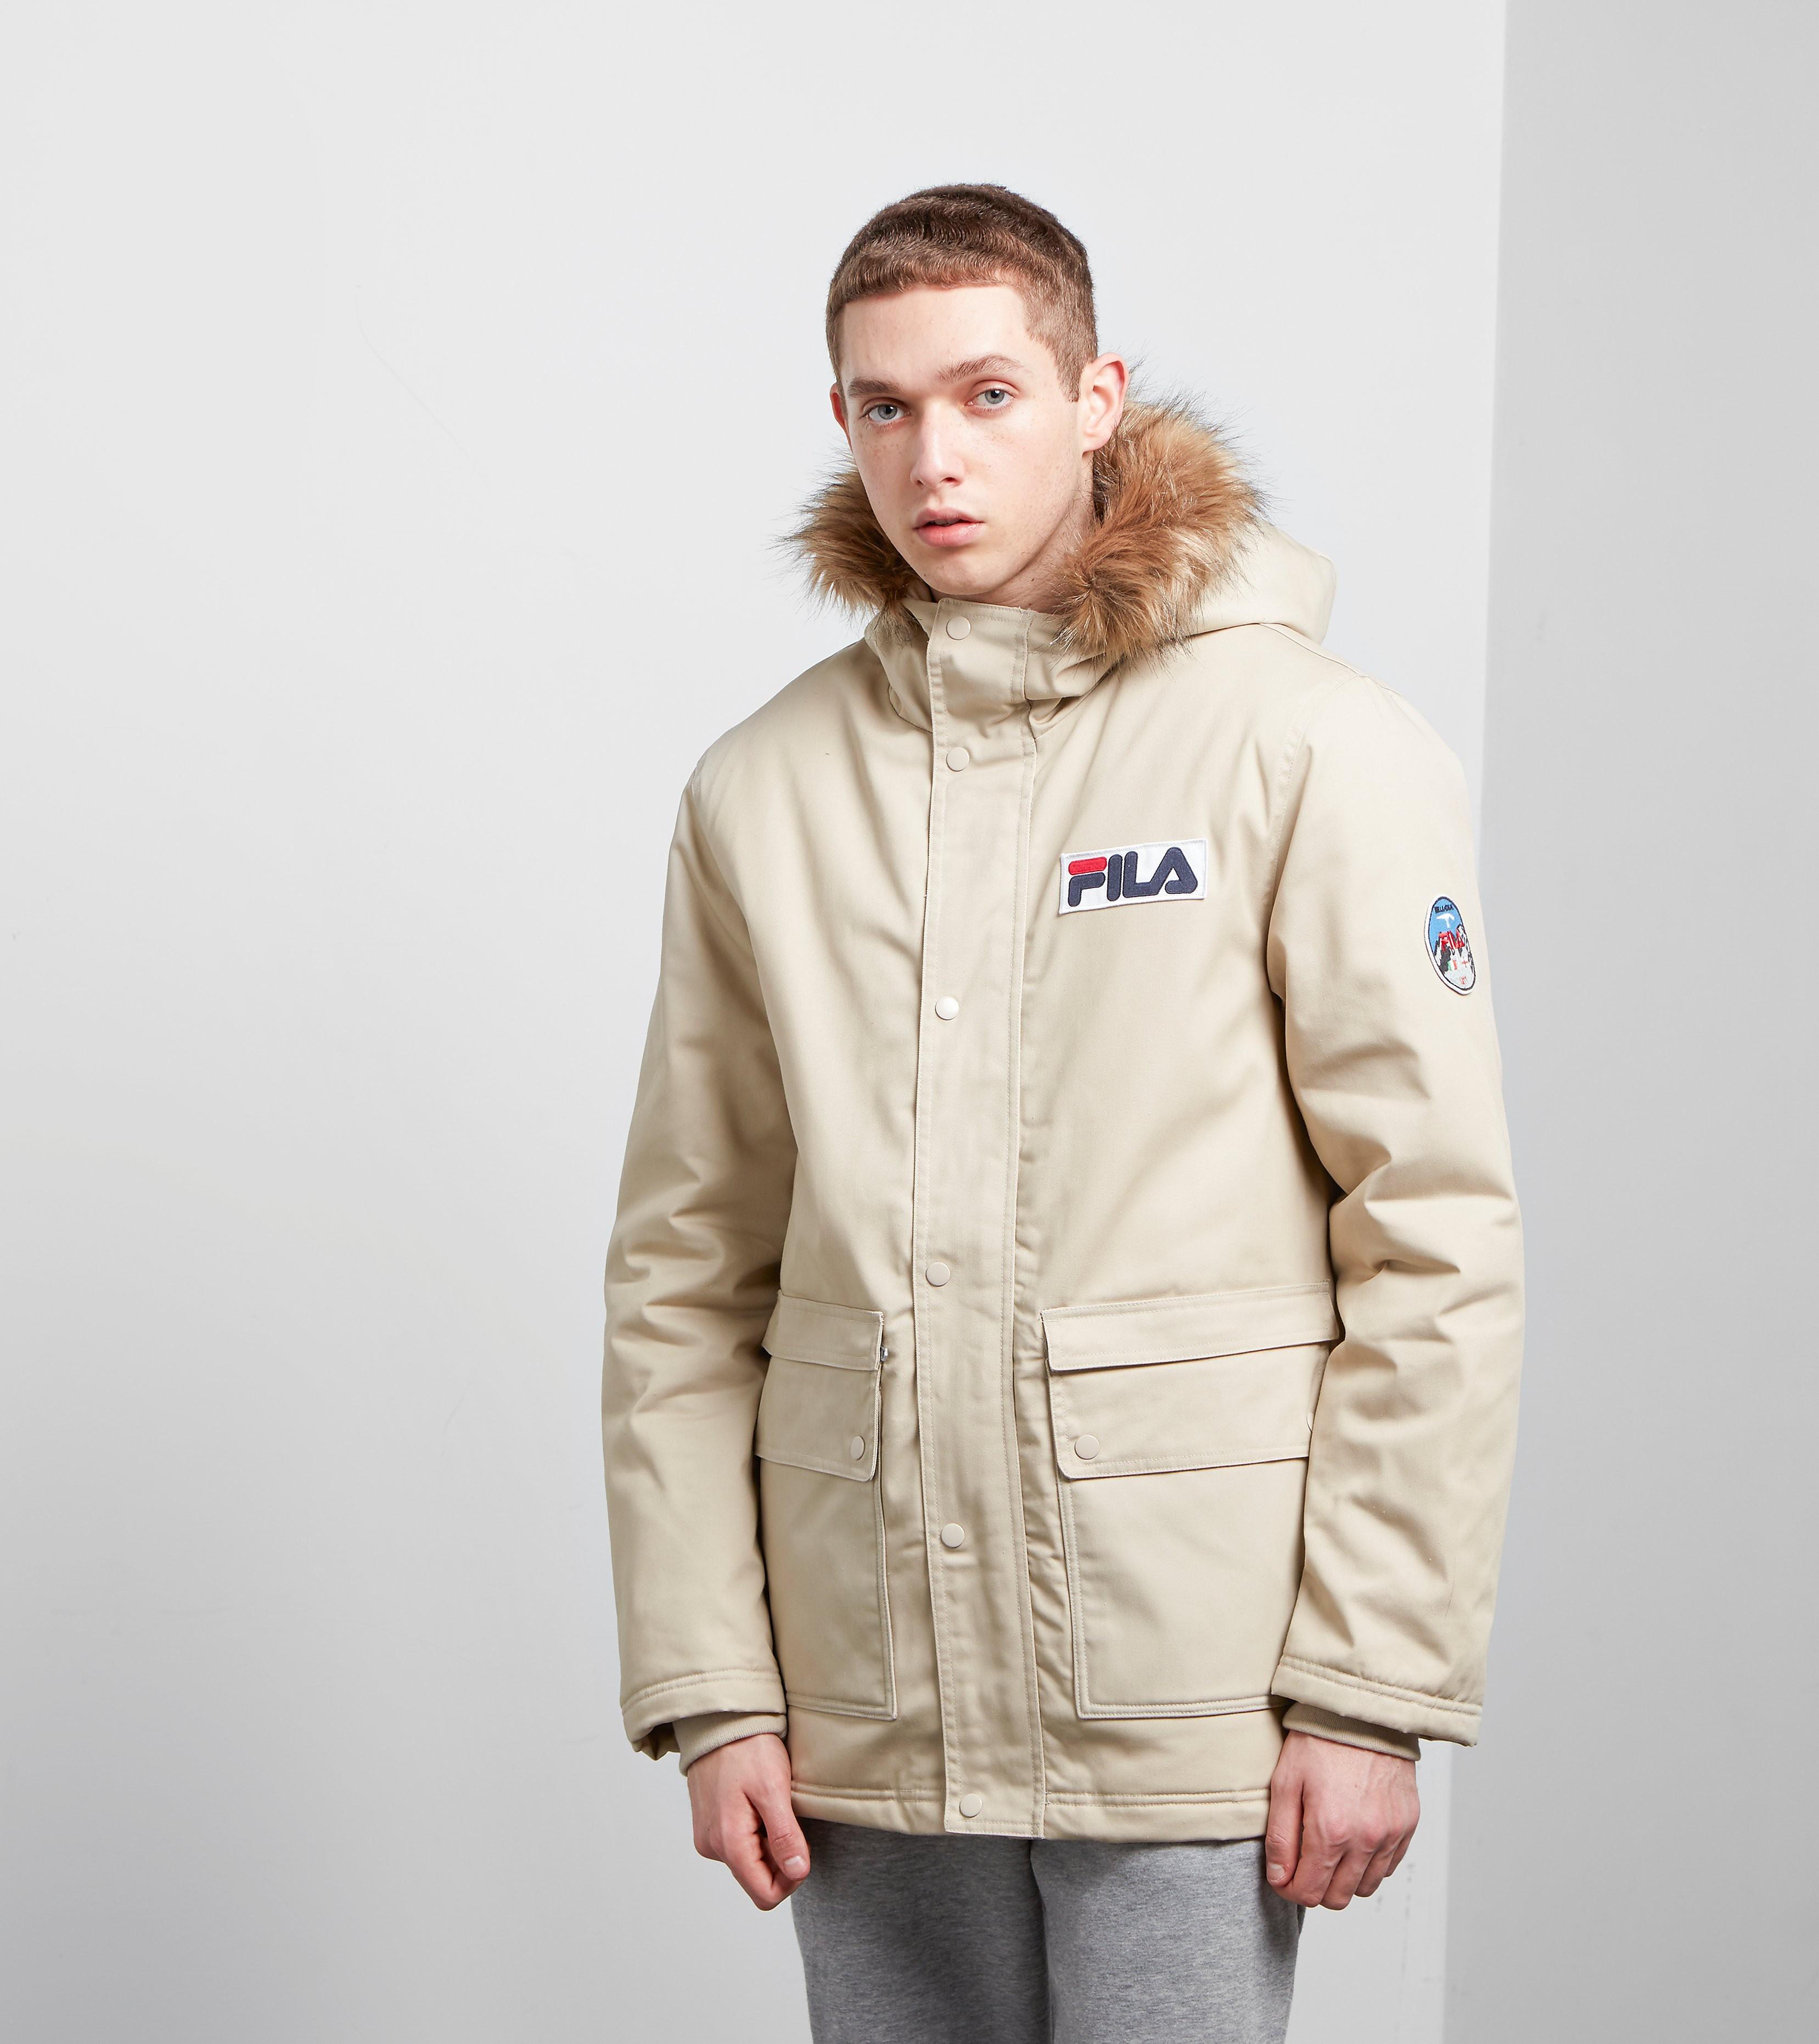 Fila Dolonne Padded Parka Jacket - Exclusive